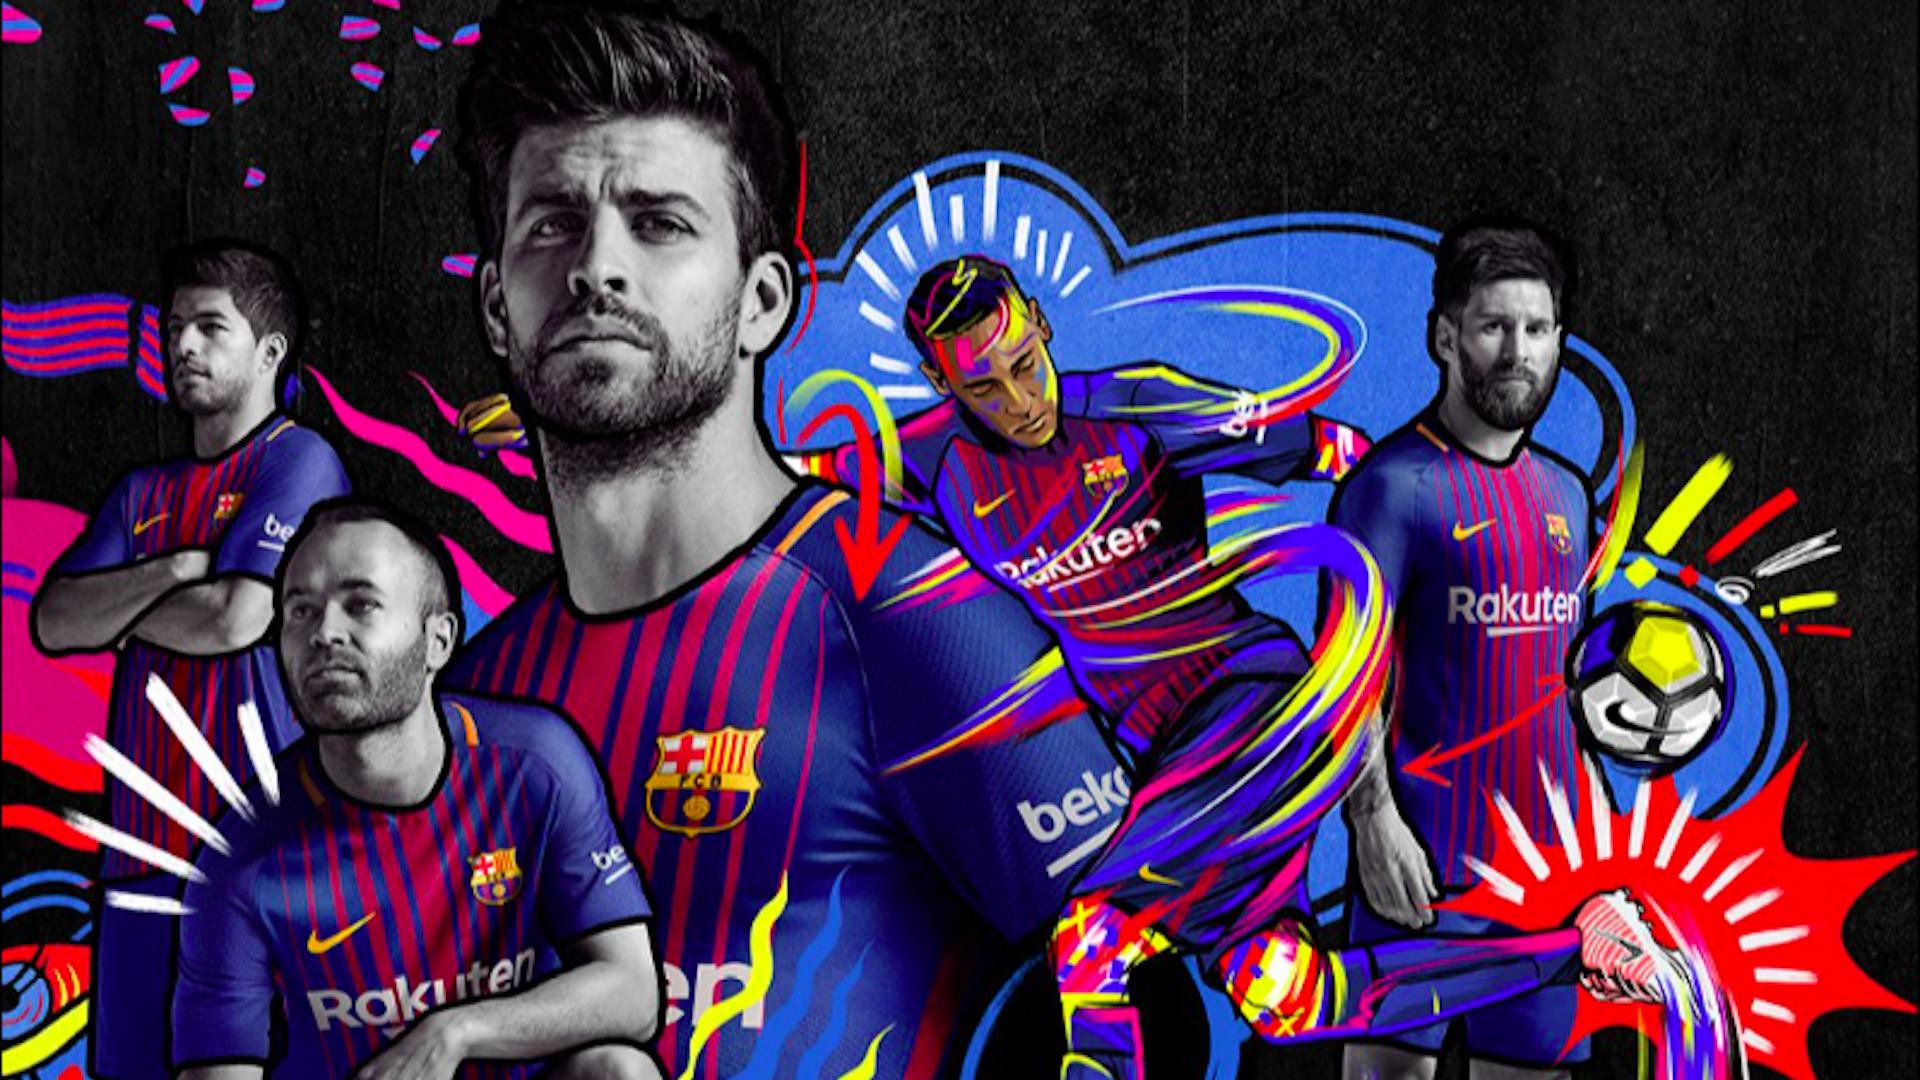 Free Messi Desktop Background Download [